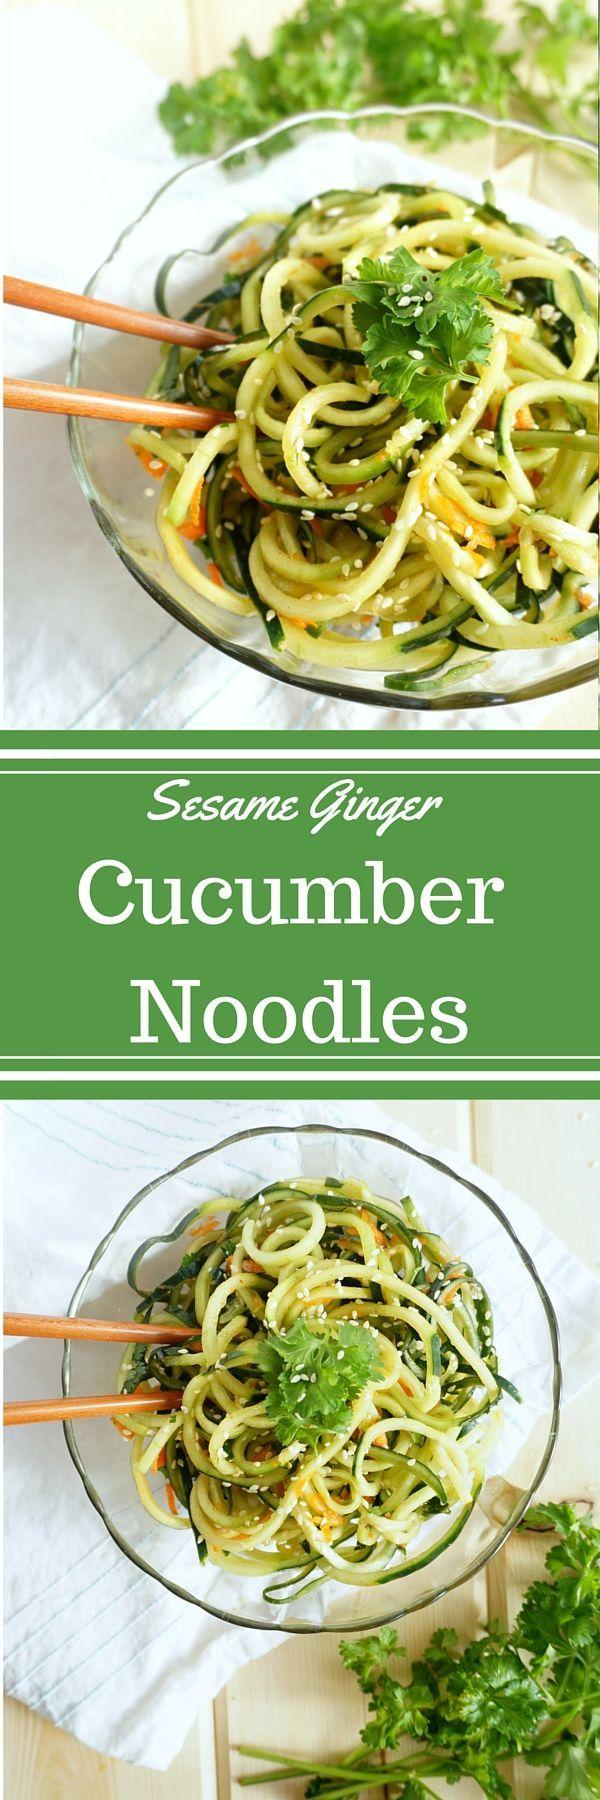 Raw Sesame Ginger Cucumber Noodles- GF and DF naturally! | savoringsimple.com